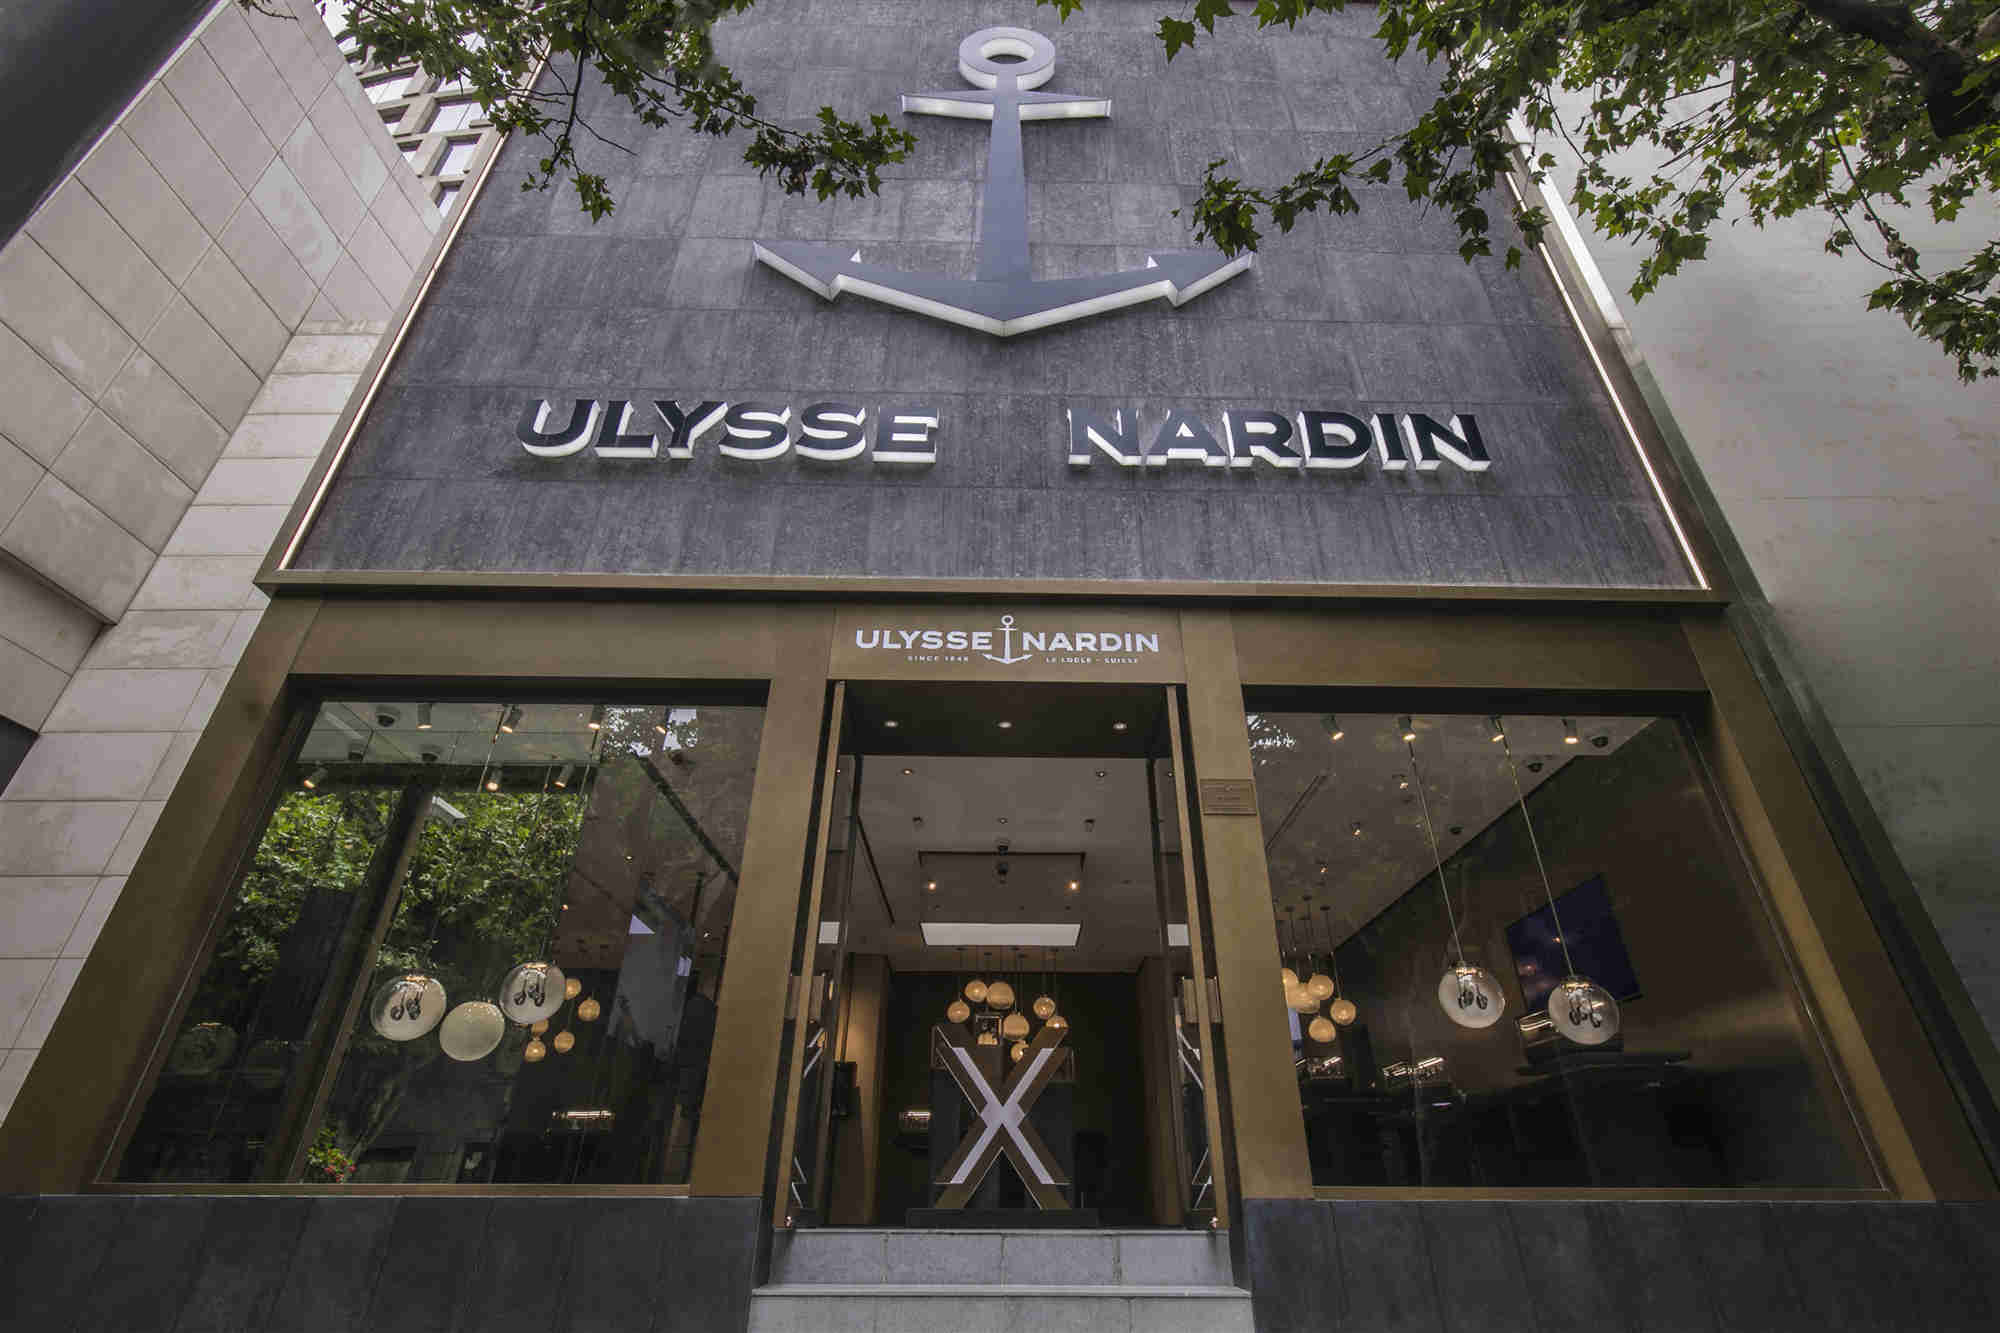 Ulysse Nardin雅典表中国首家旗舰店于上海盛大揭幕.jpg